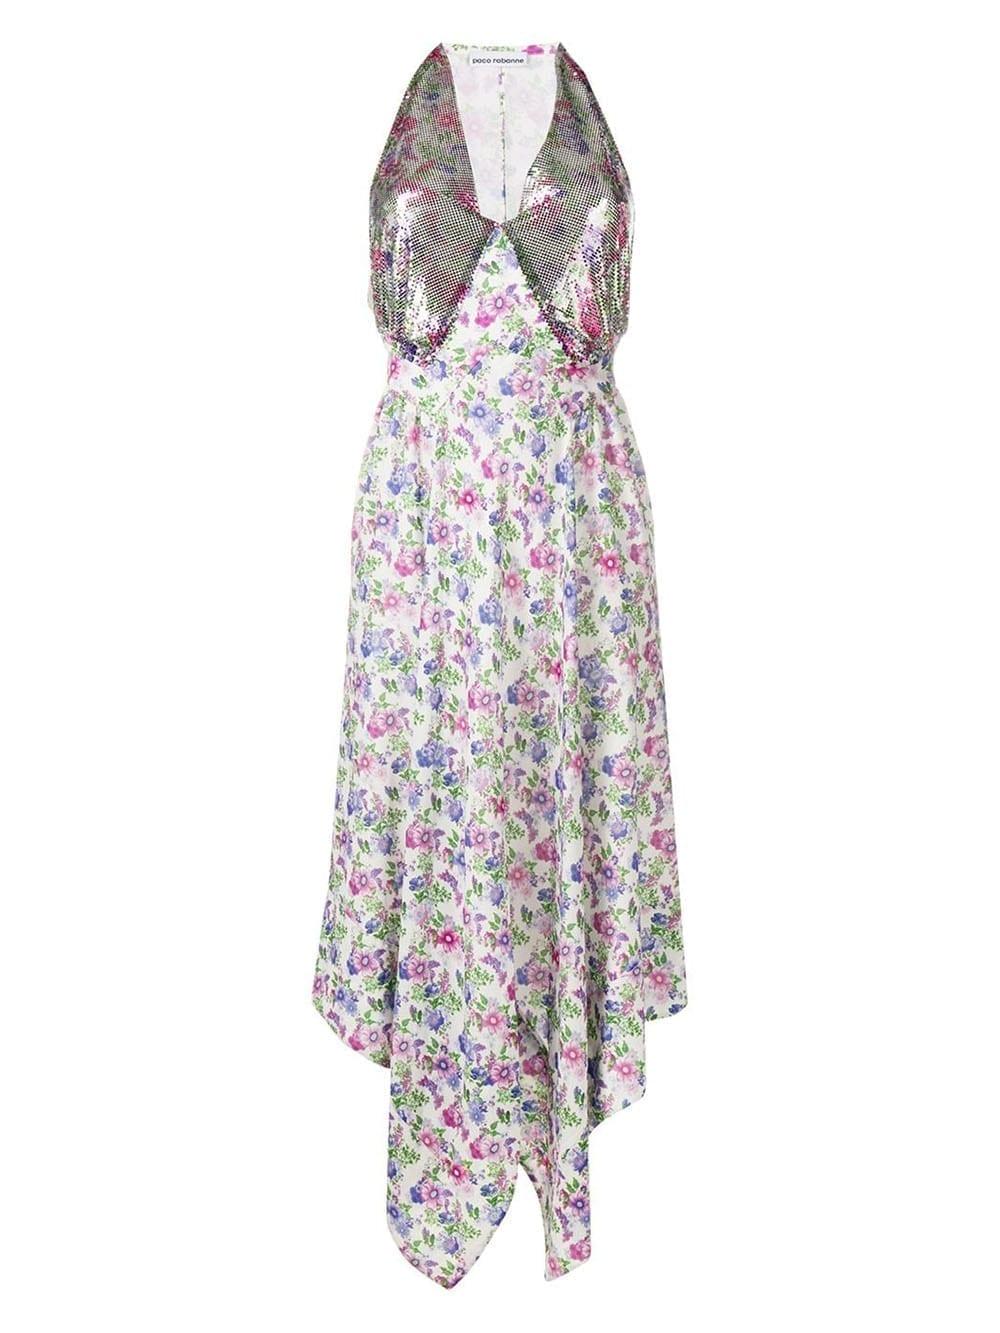 PACO RABANNE Metallic Floral Midi Dress